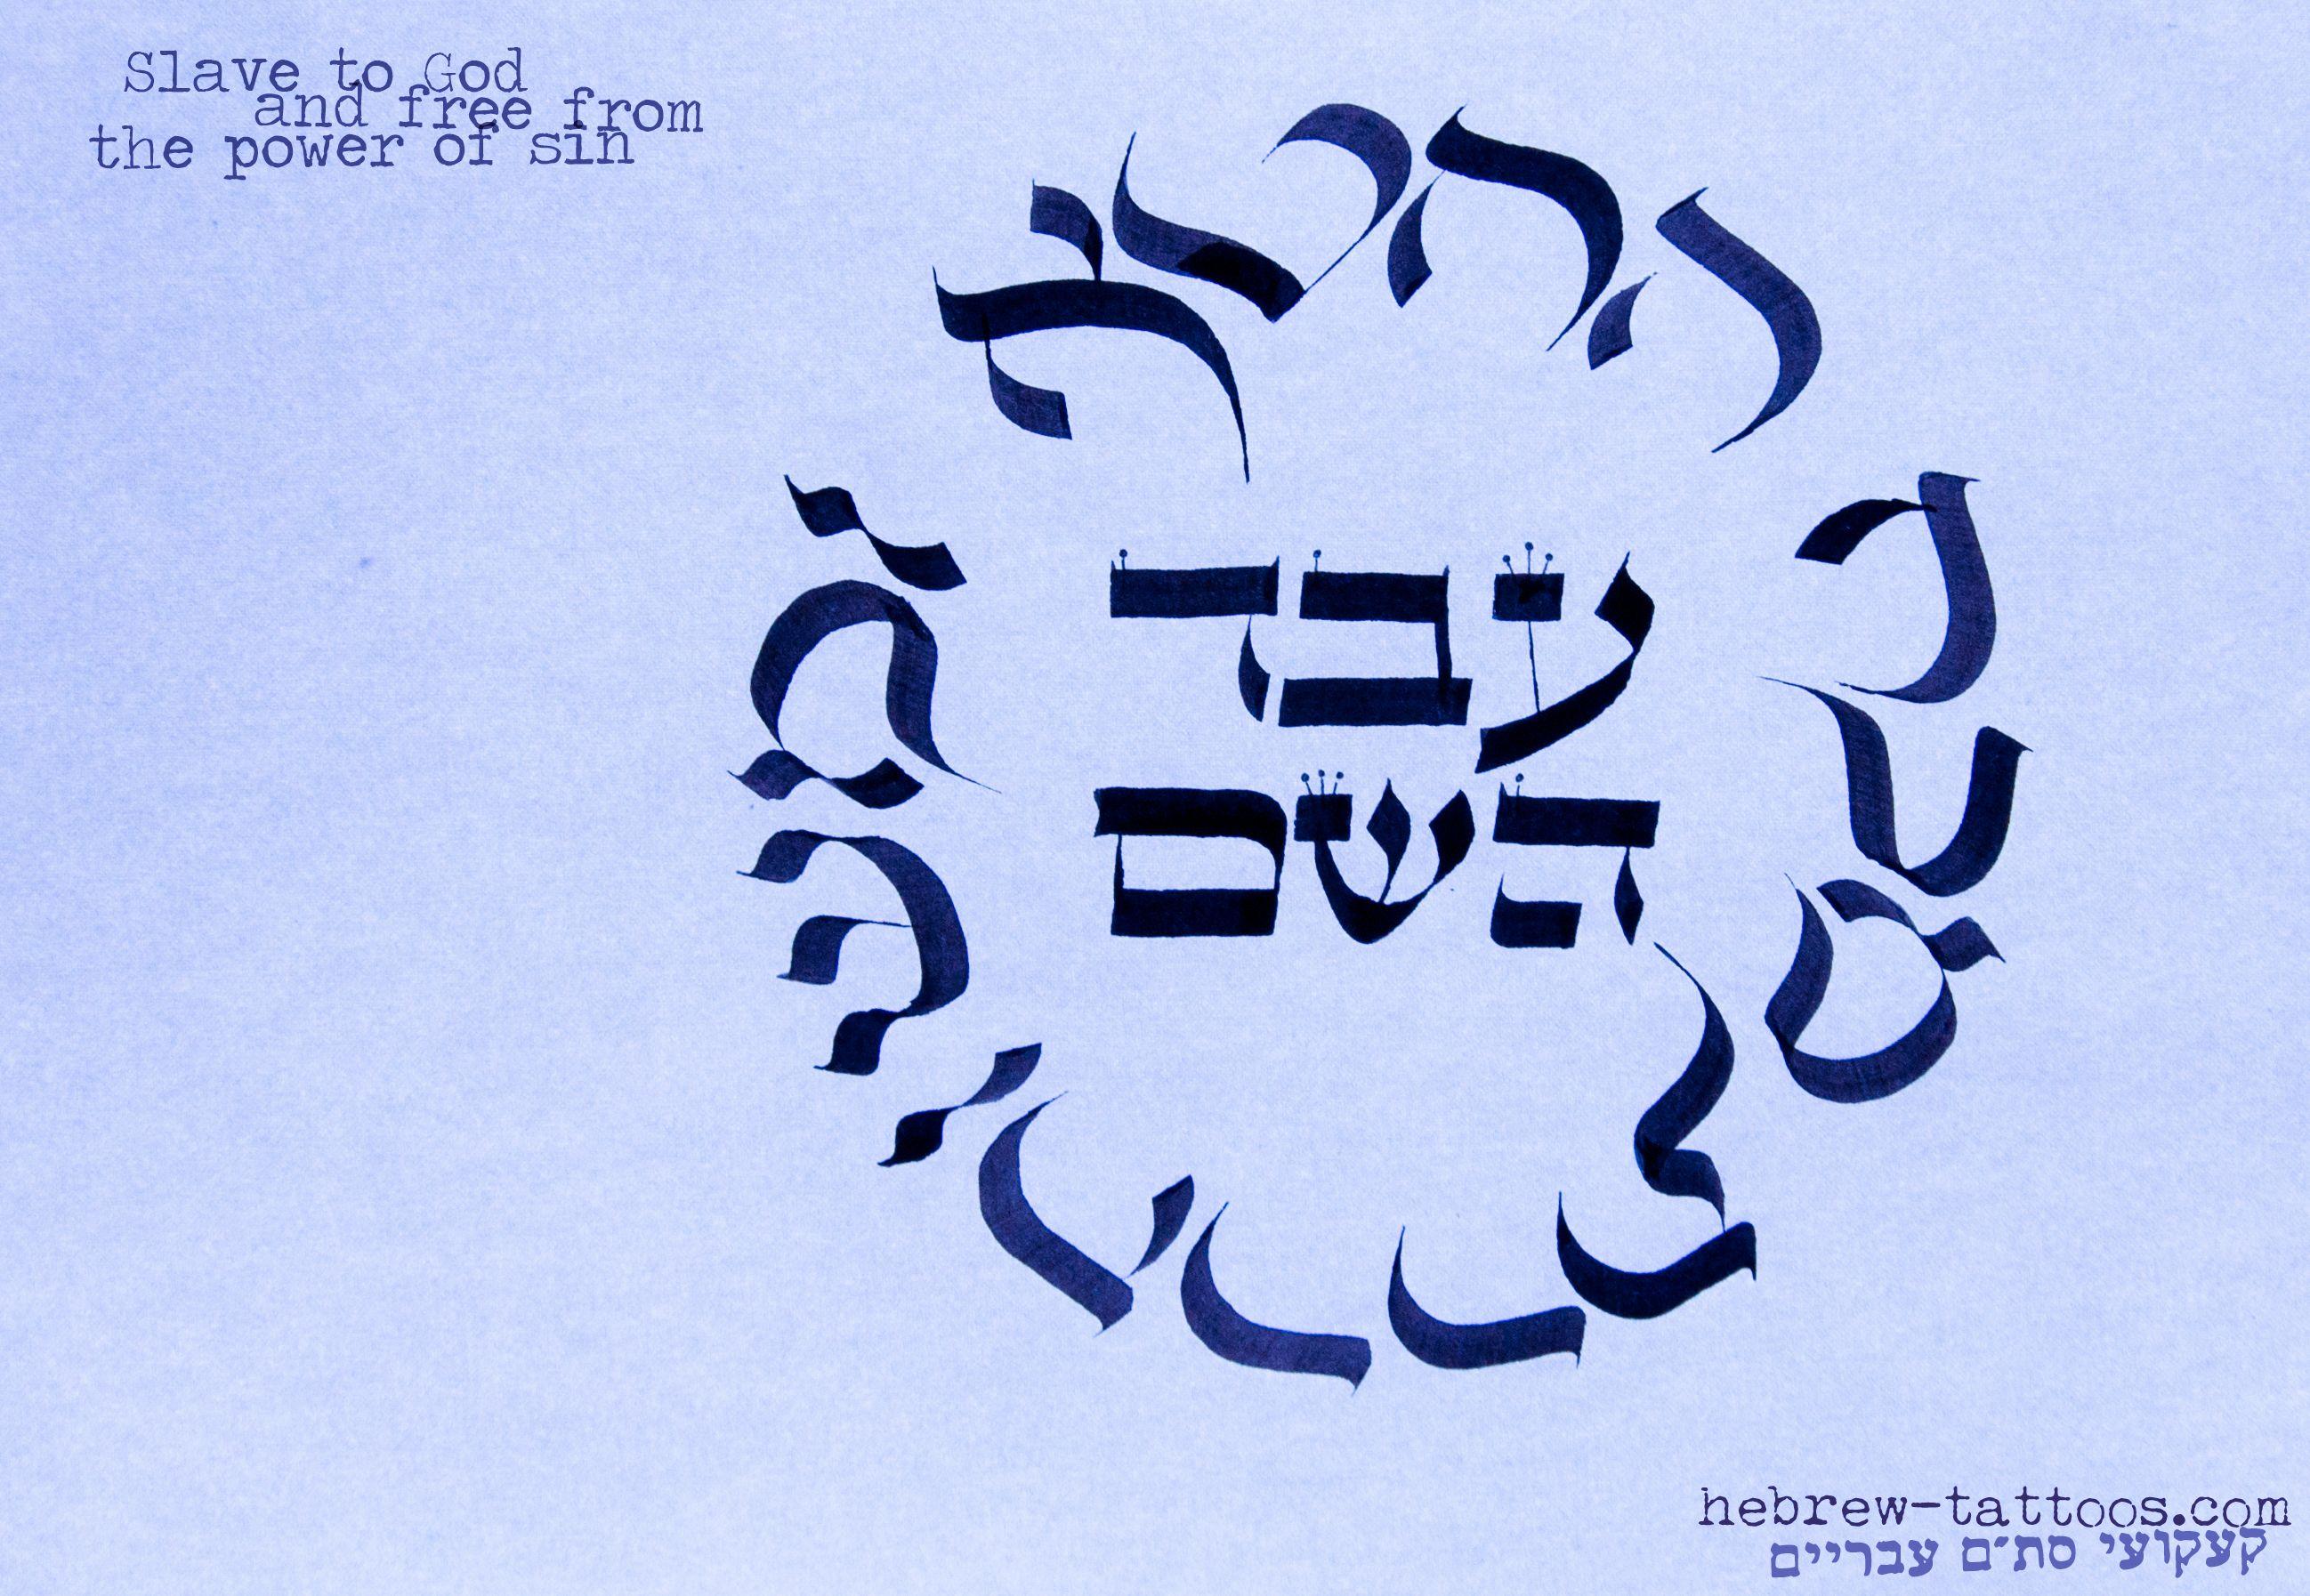 Shema israel bracelet israel bible jewish hebrew prayer kabbalah shma - Slave To God Free From The Power Of Sin By Hebrew Tattoos Com